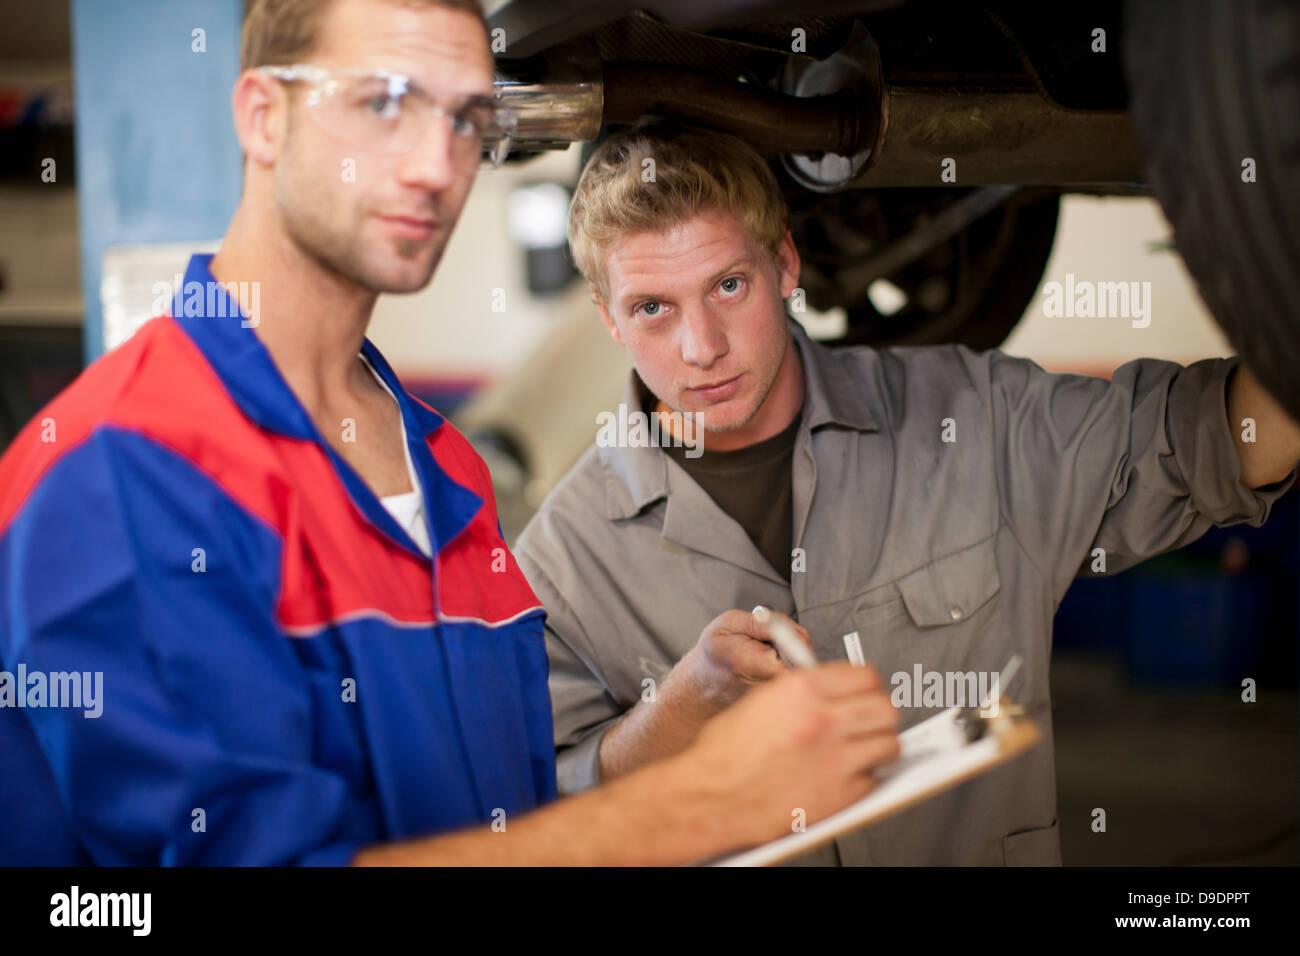 Car mechanics discussing and analyzing car repair - Stock Image